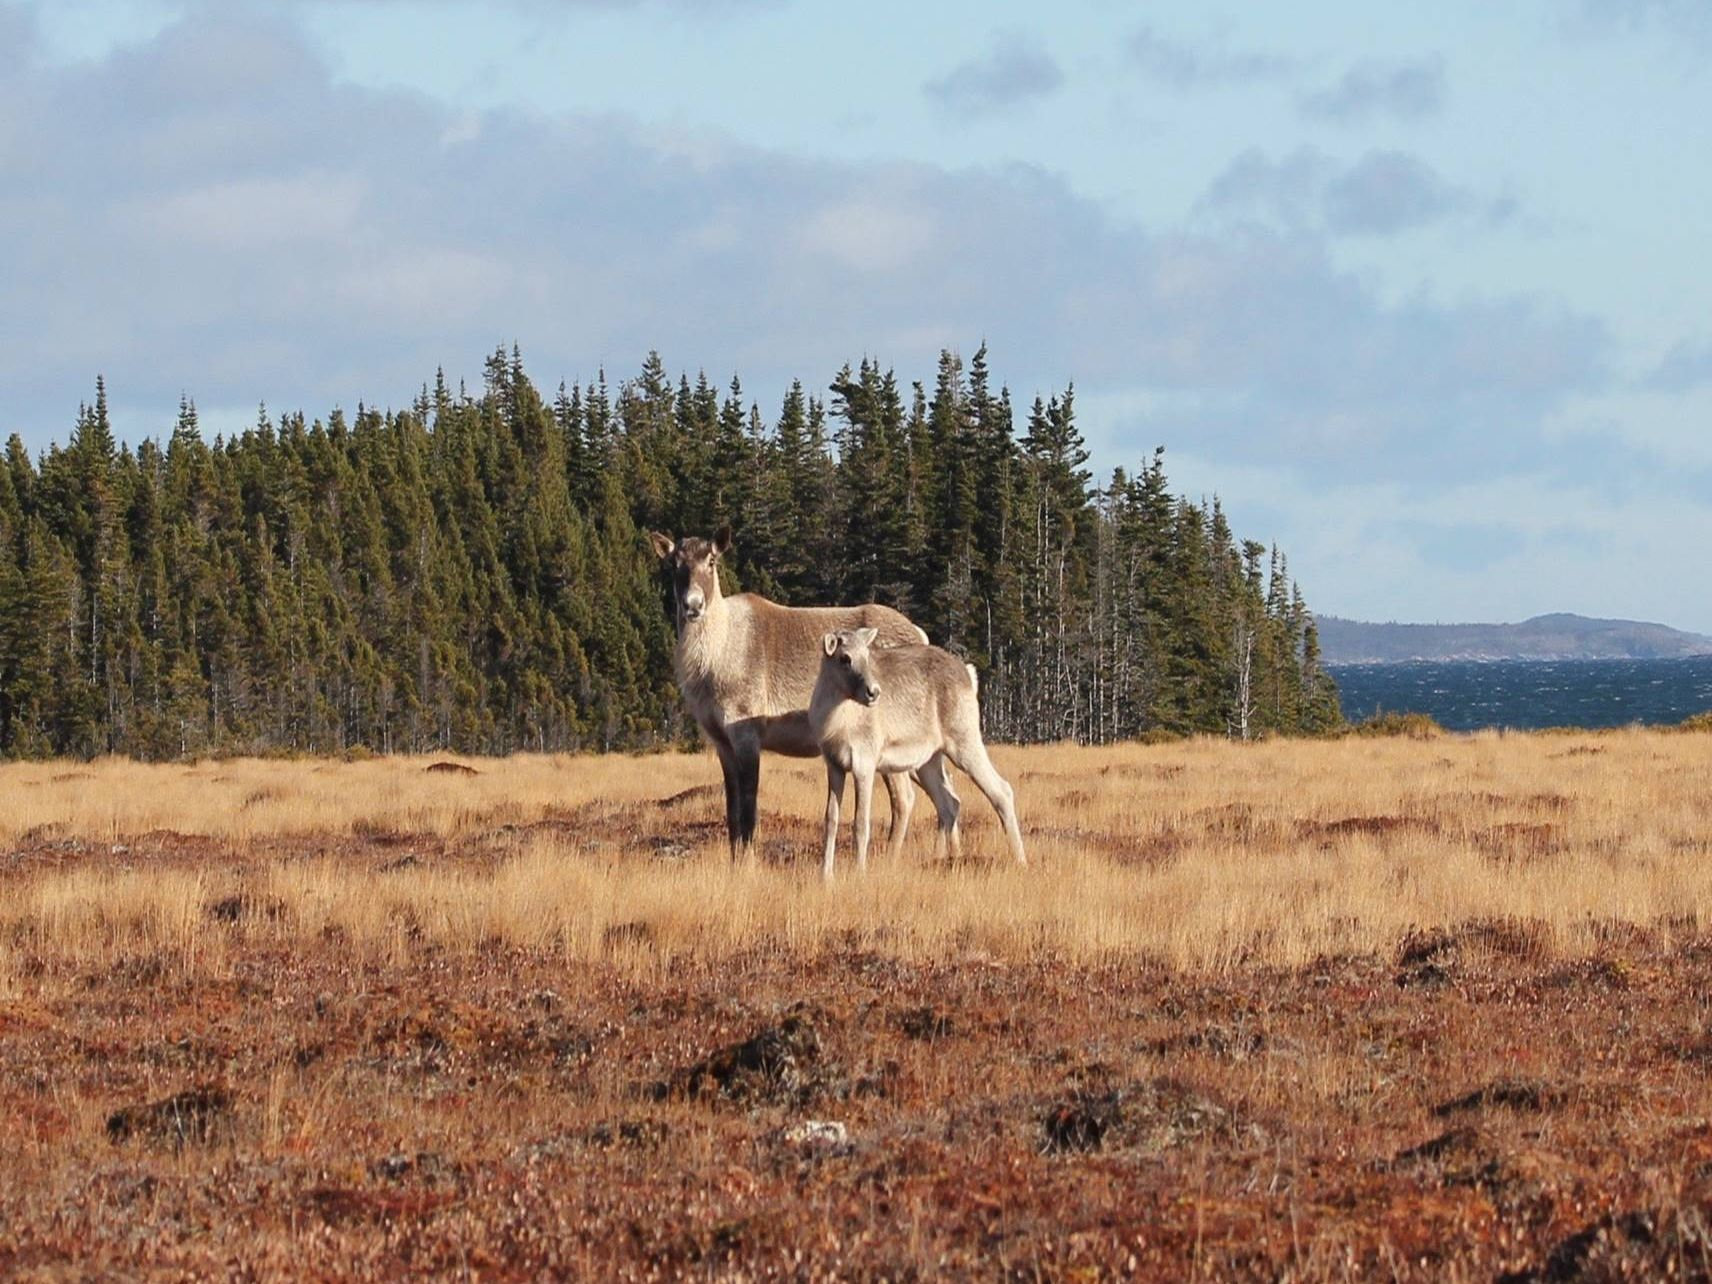 Research Spotlight Series: Wildlife Evolutionary Ecology Lab